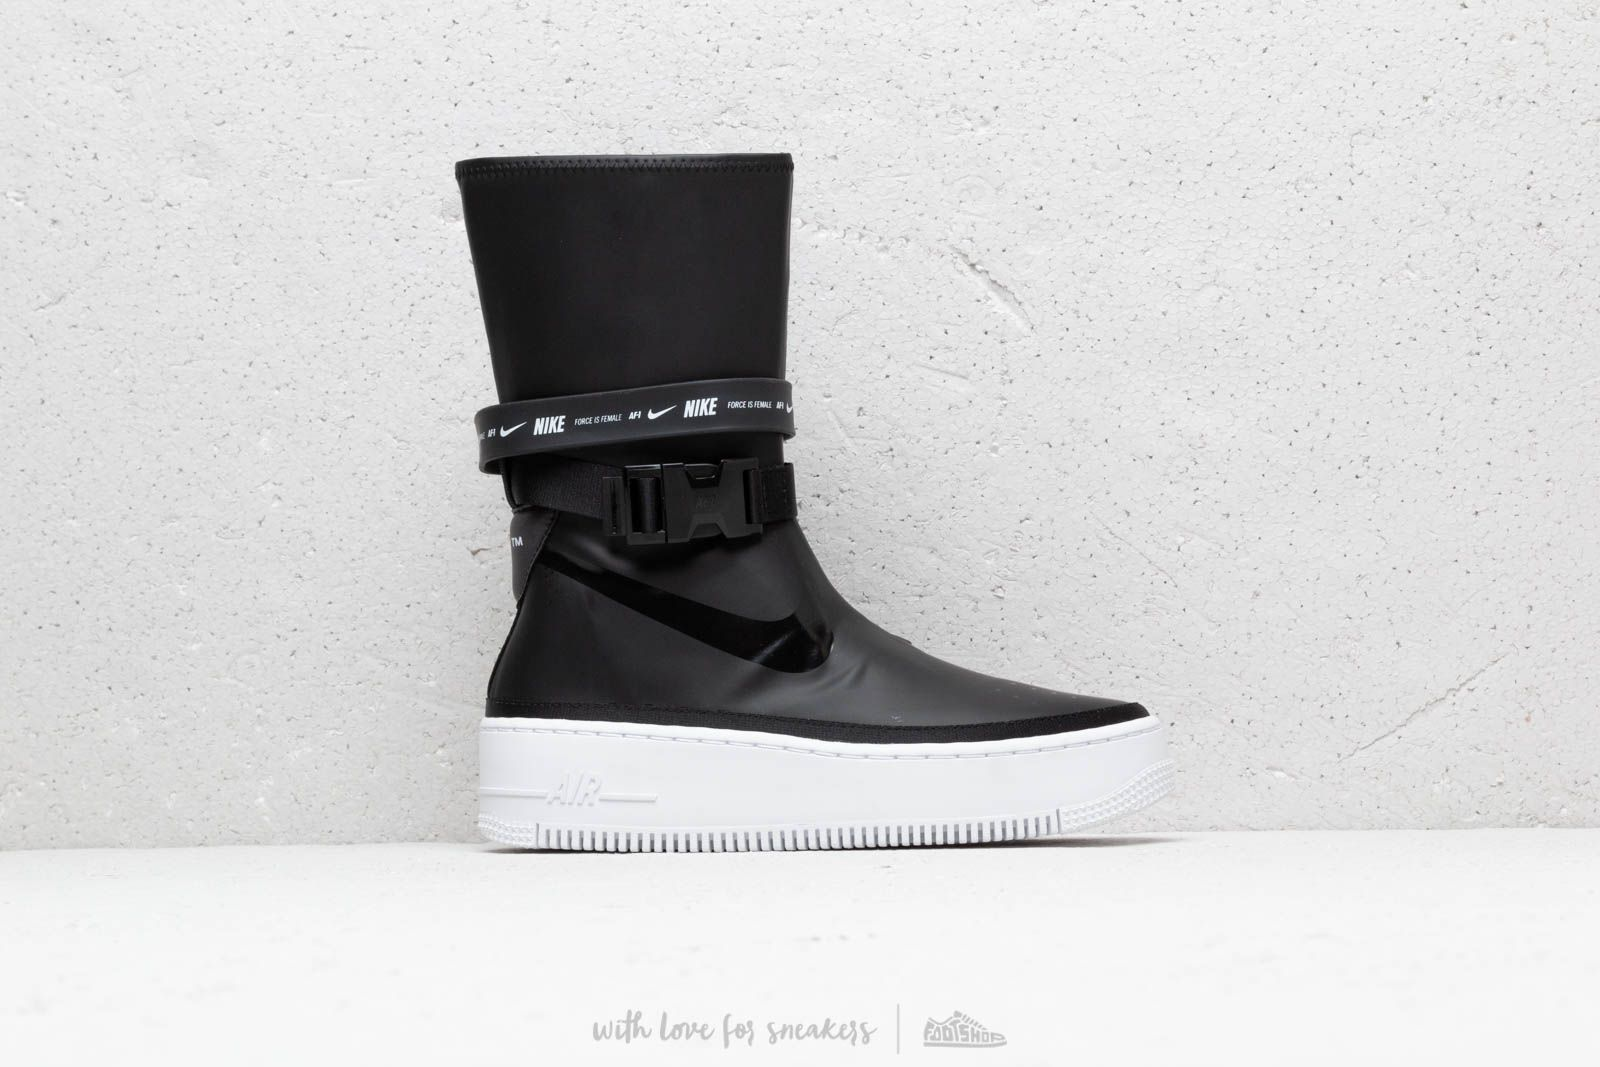 1a7a5ace8030 Nike W Af1 Sage Hi Black  Black-White at a great price 183 €